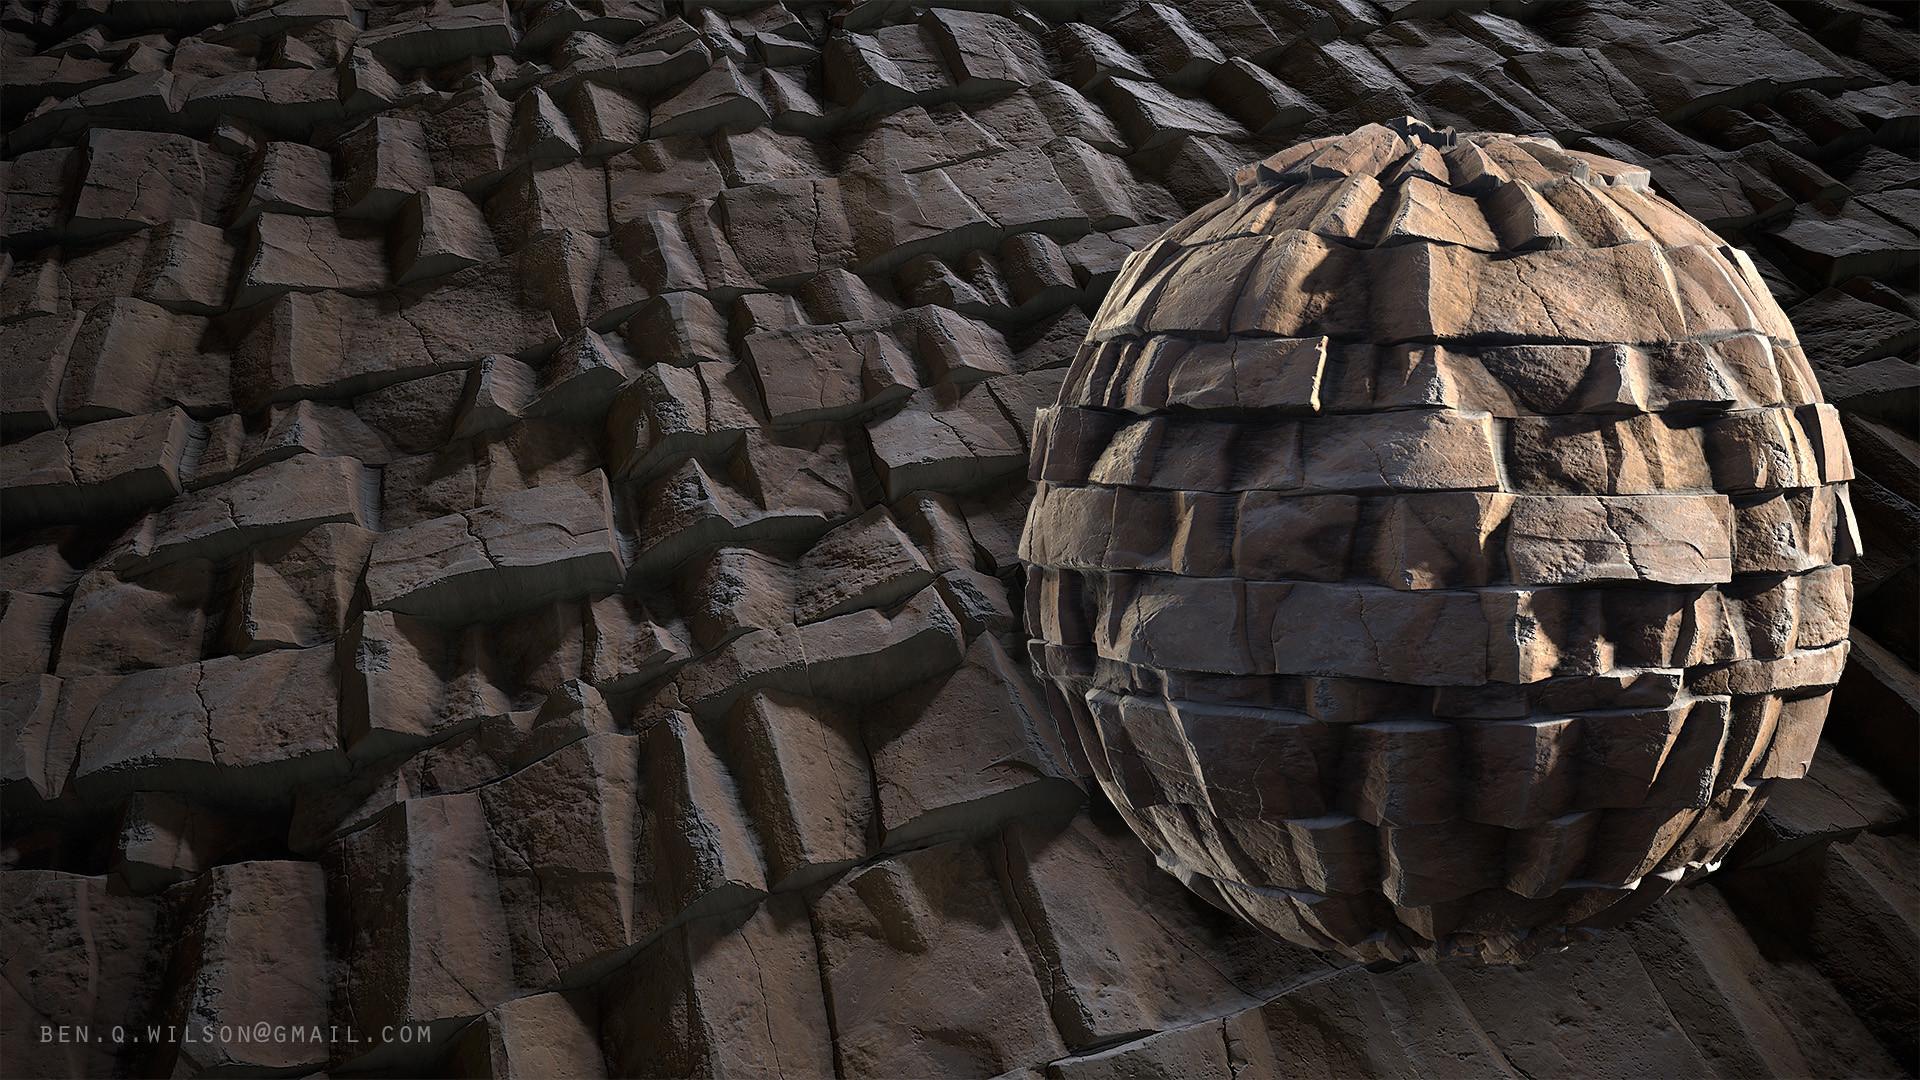 Ben wilson rock cliff a render 03